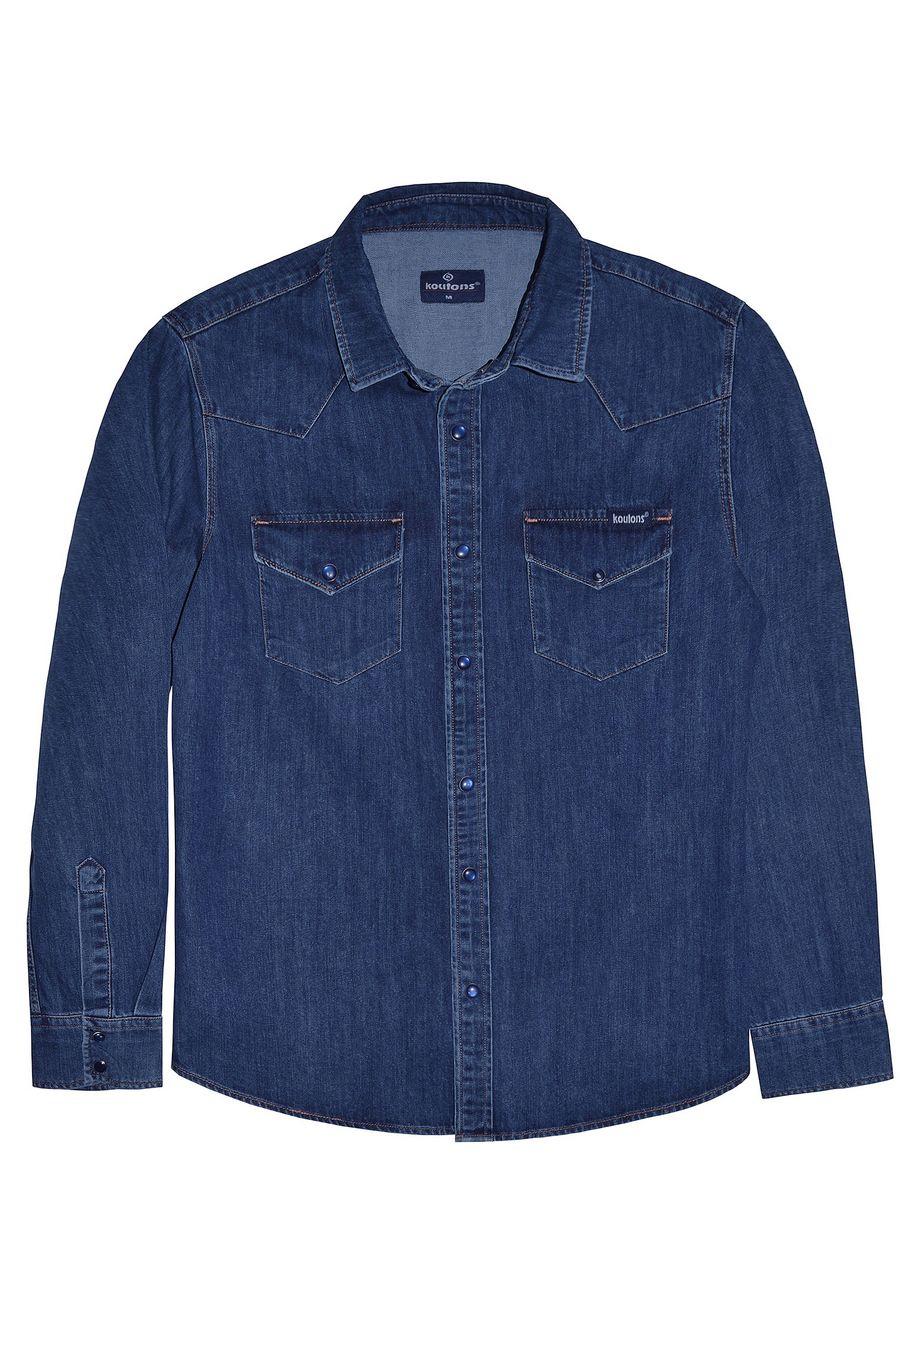 Рубашка мужская Koutons 1997 Talin Blue 02 - фото 1